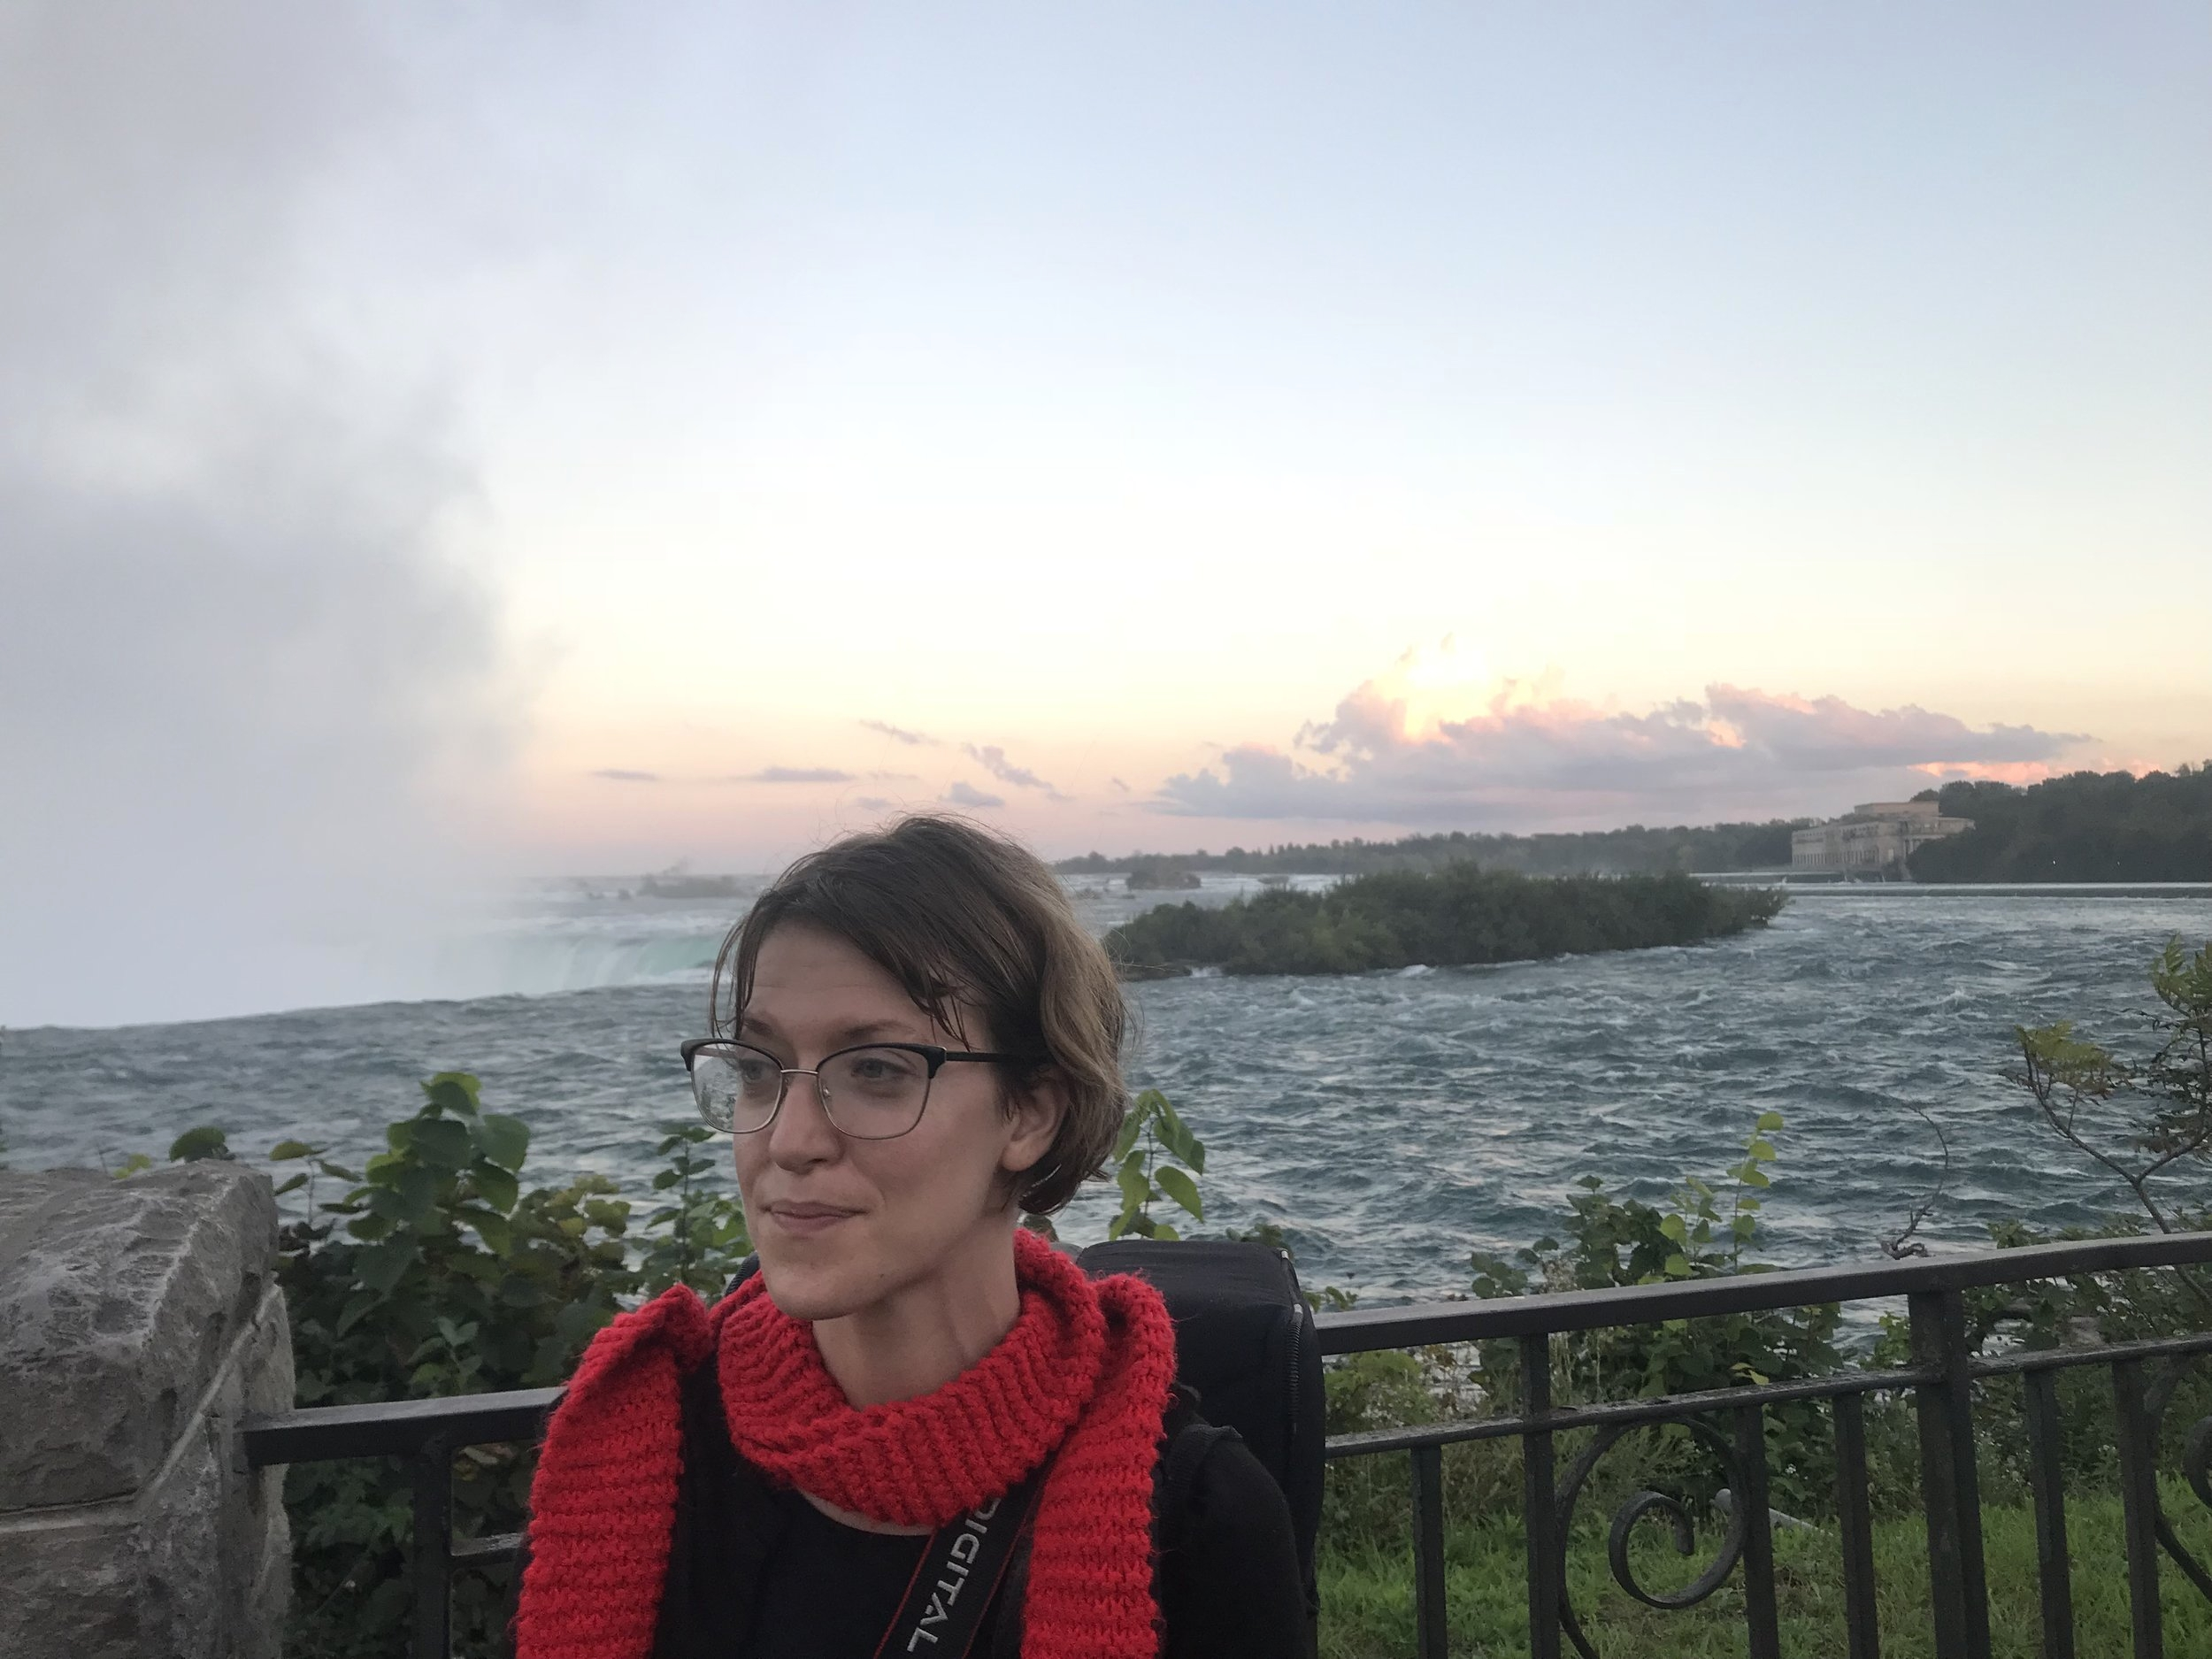 Niagara Falls. End of first International Tour.